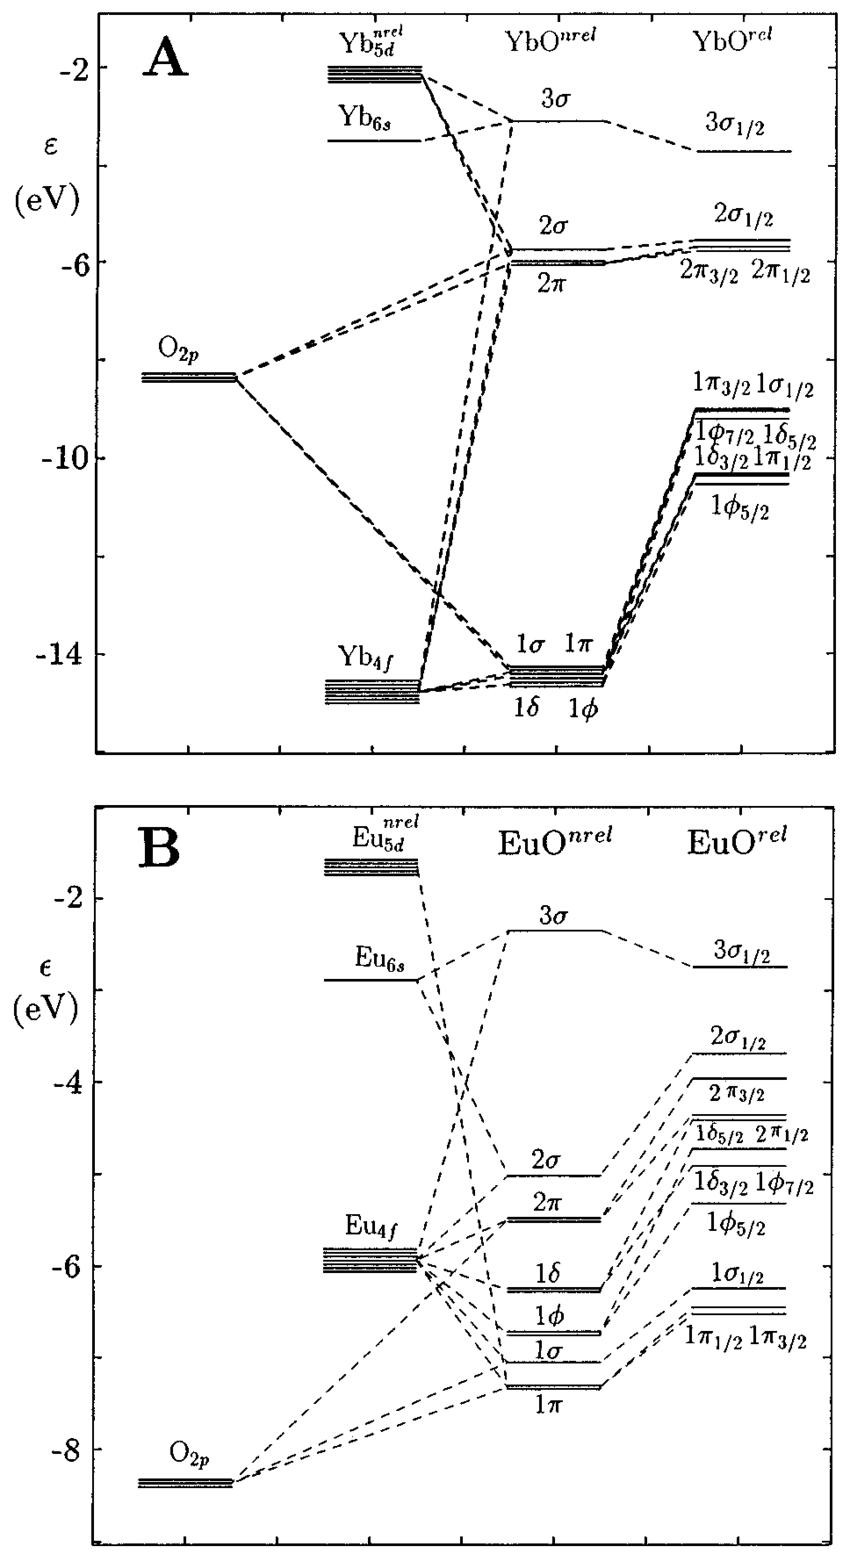 medium resolution of mo level diagrams a yb f 13 1 o and yb f 14 s